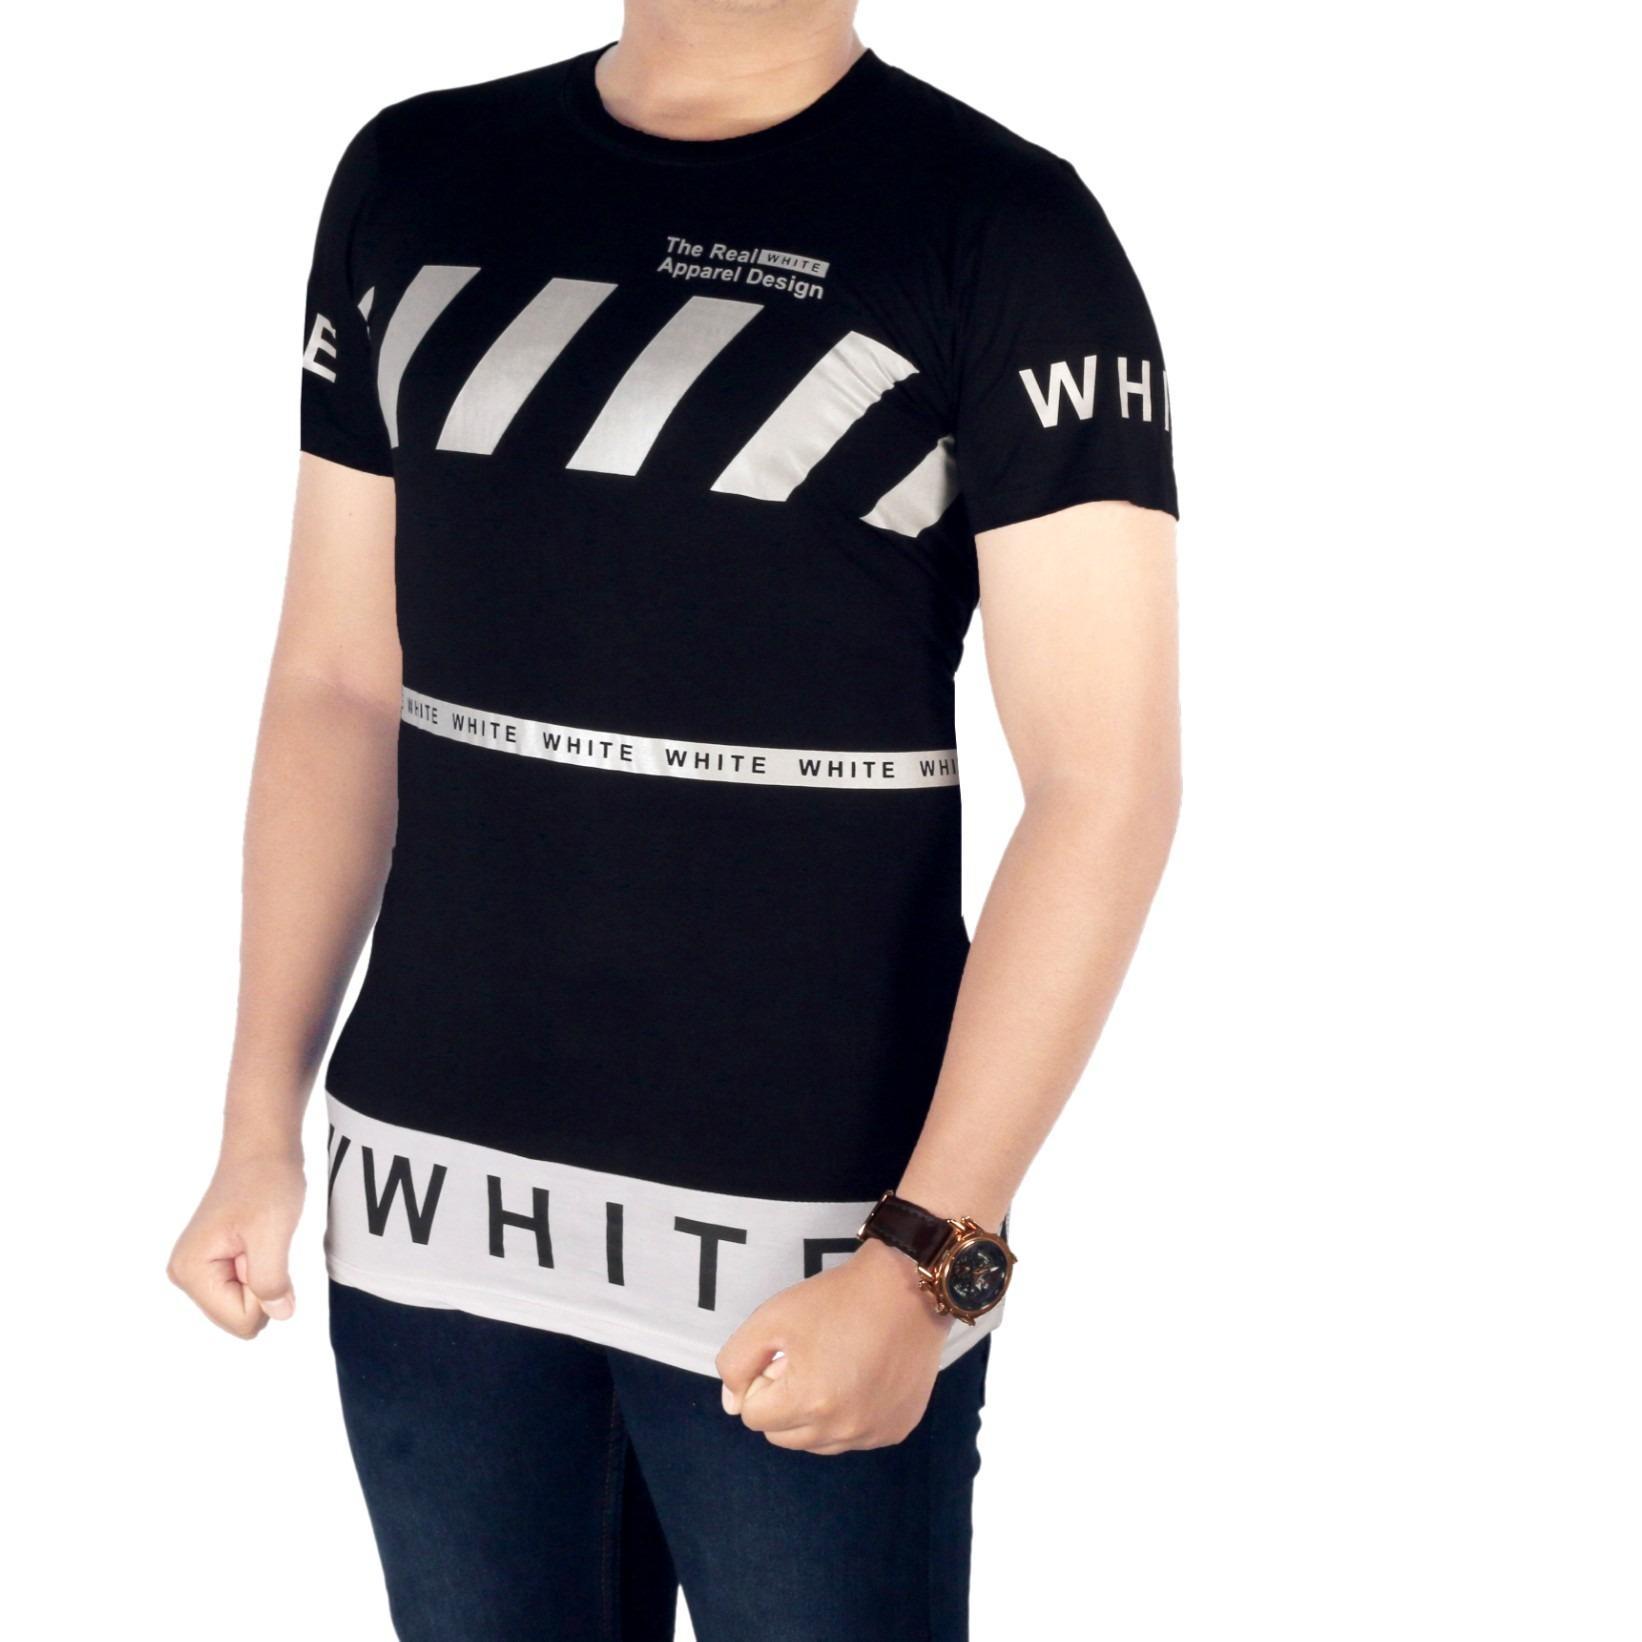 Toko Dgm Fashion1 Baju Kaos Lengan Pendek Distro Baju Kaos Cucian Pendek Baju Kaos Lengan Pendek Baju Kaos Bermotiv Baju Kaos Pria Baju Kaos Pria Baju Kaos Cucian Panjang Baju Kaos Bermotiv Pria Baju Kaos Nn 5504 Hitam Online Di Dki Jakarta